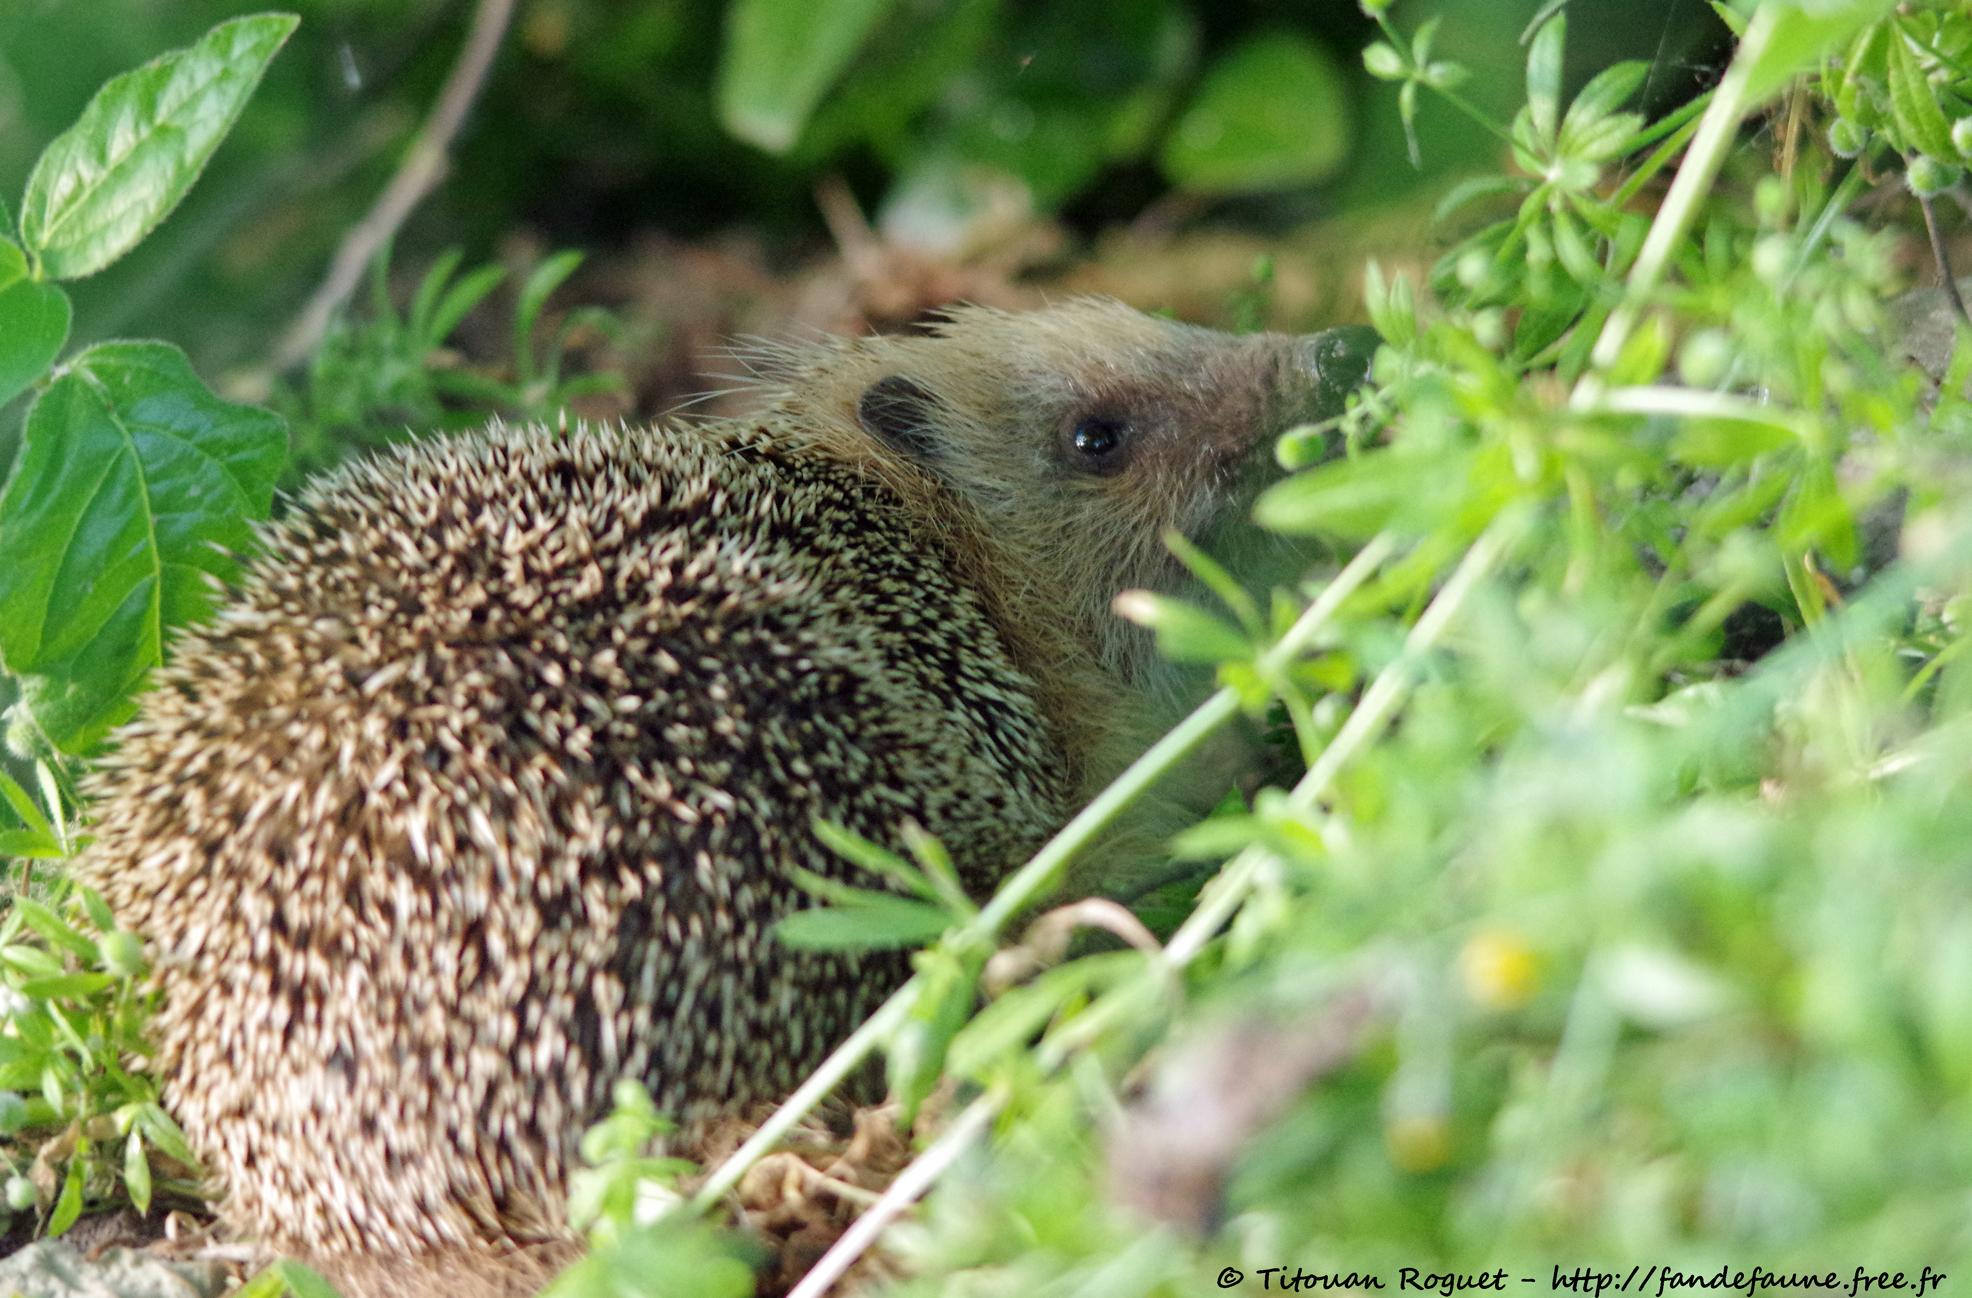 Hérisson d'Europe (Erinaceus europaeus) - European hedgehog